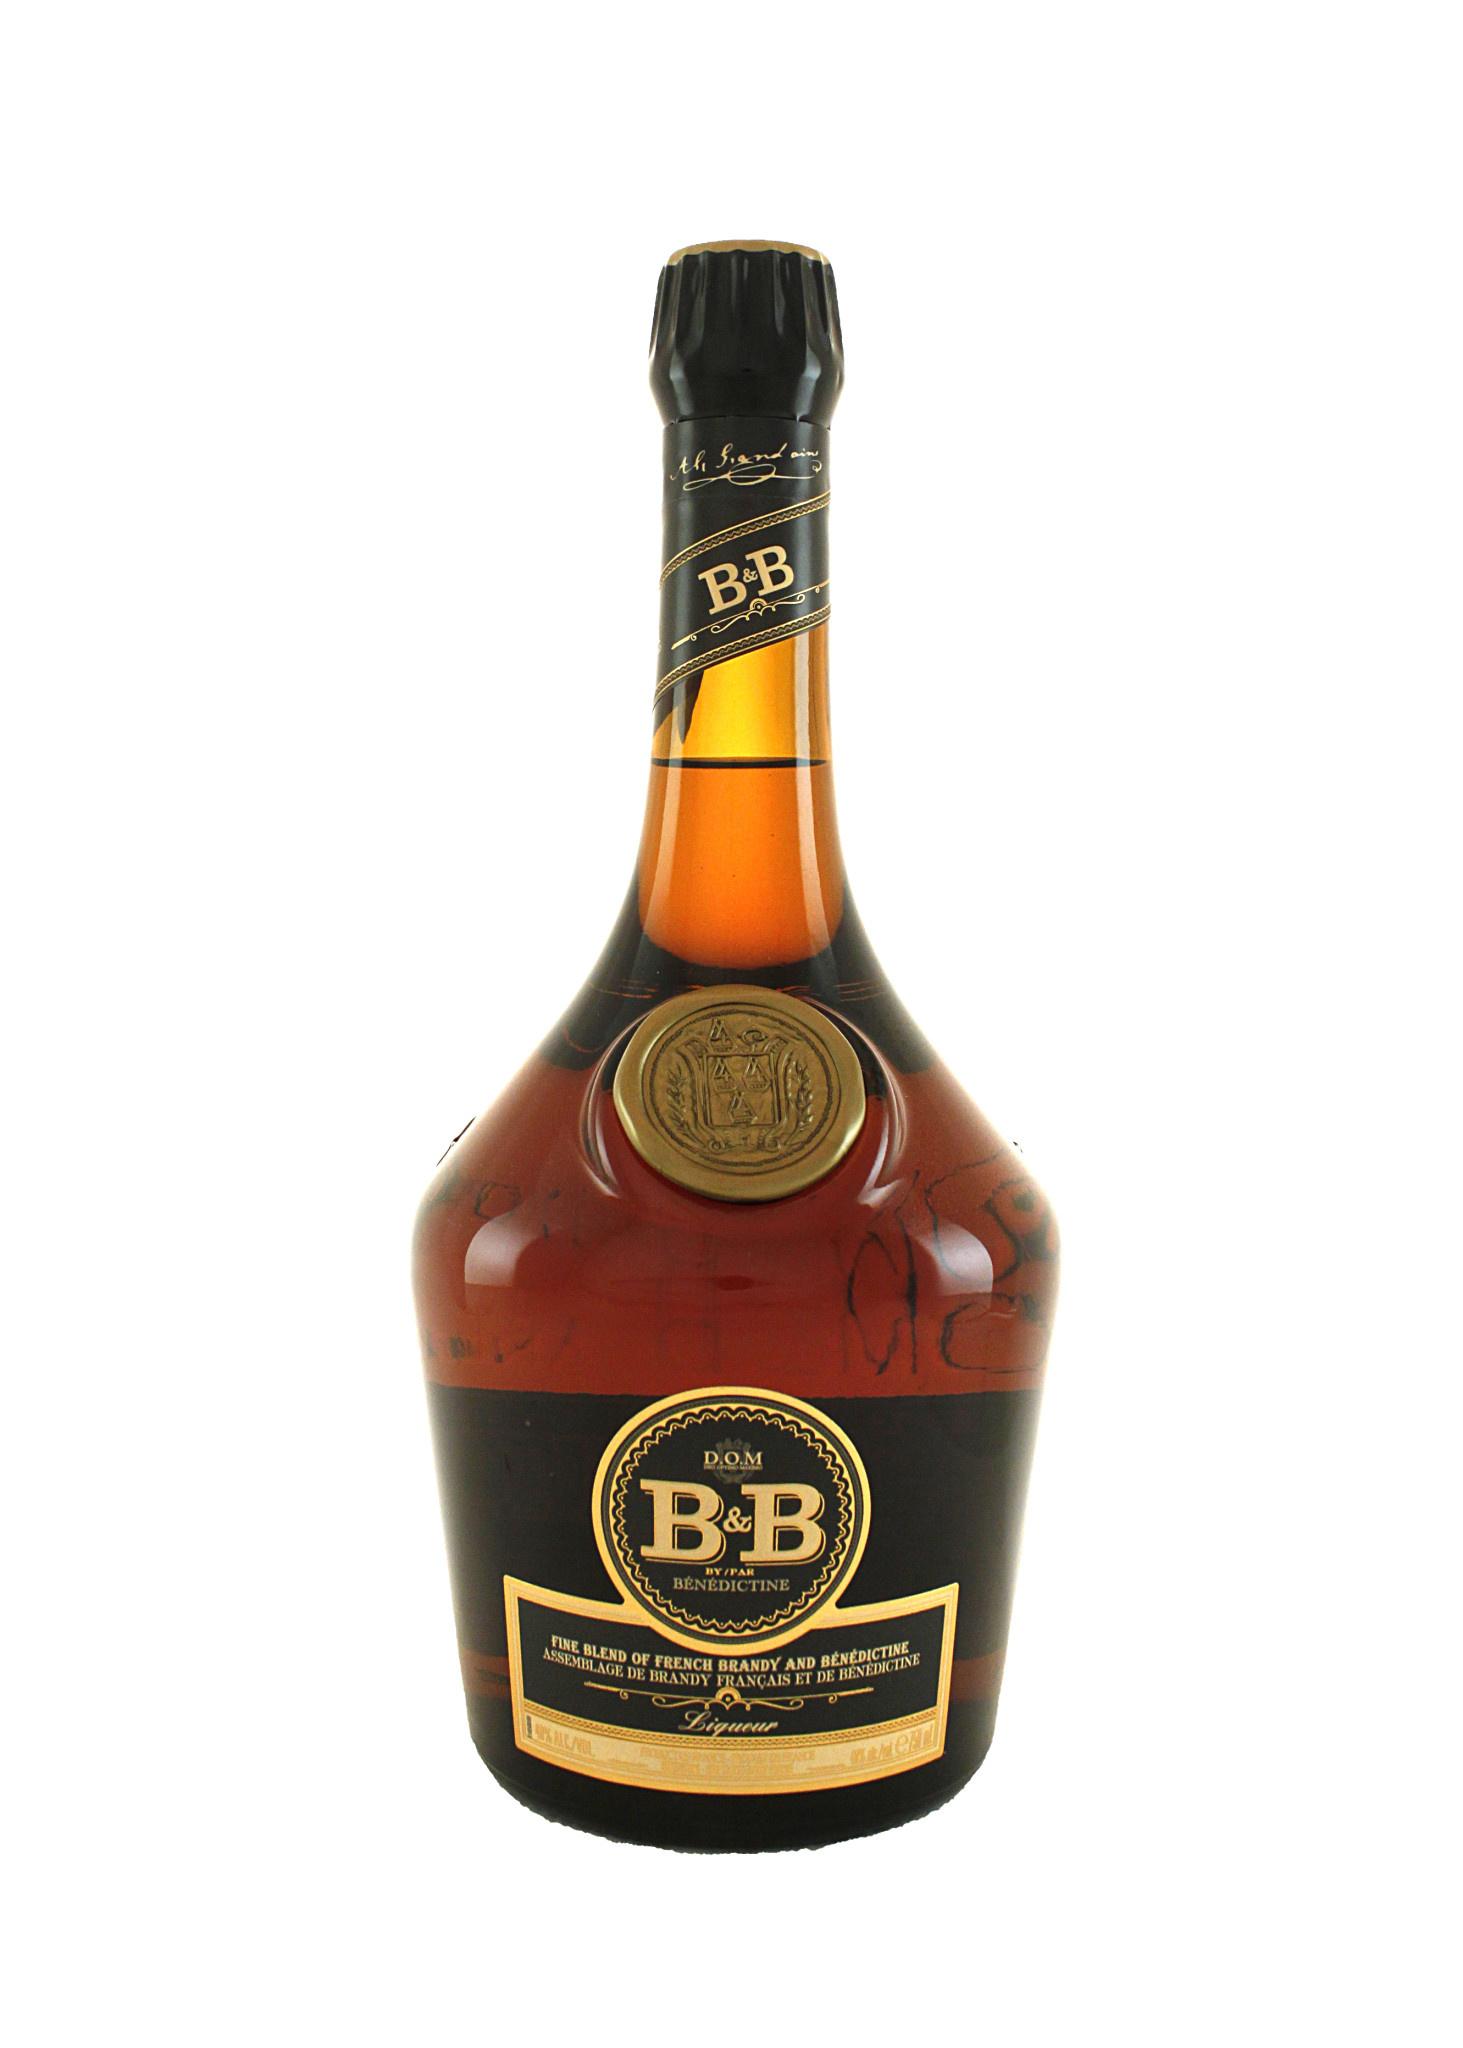 B & B Benedictine and Brandy Liqueur, D.O.M., France